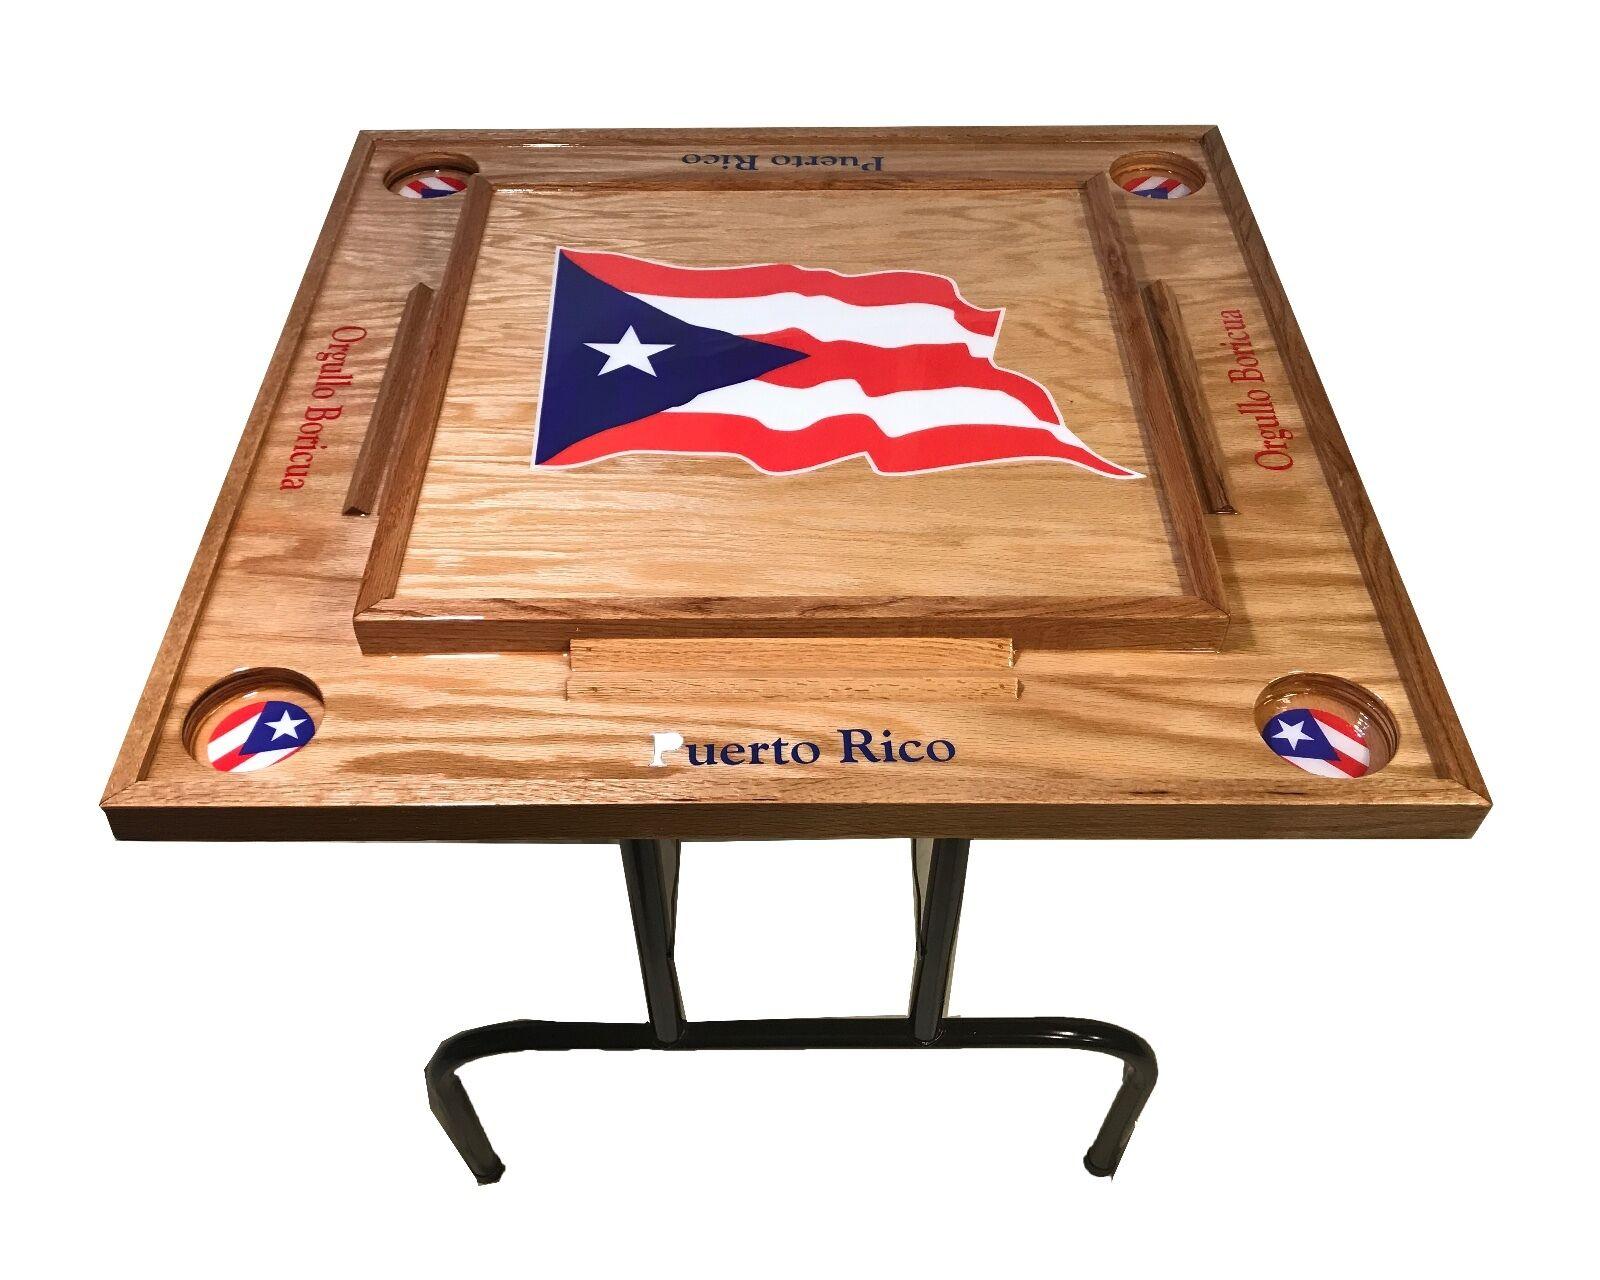 Puerto Rico Domino table avec le drapeau